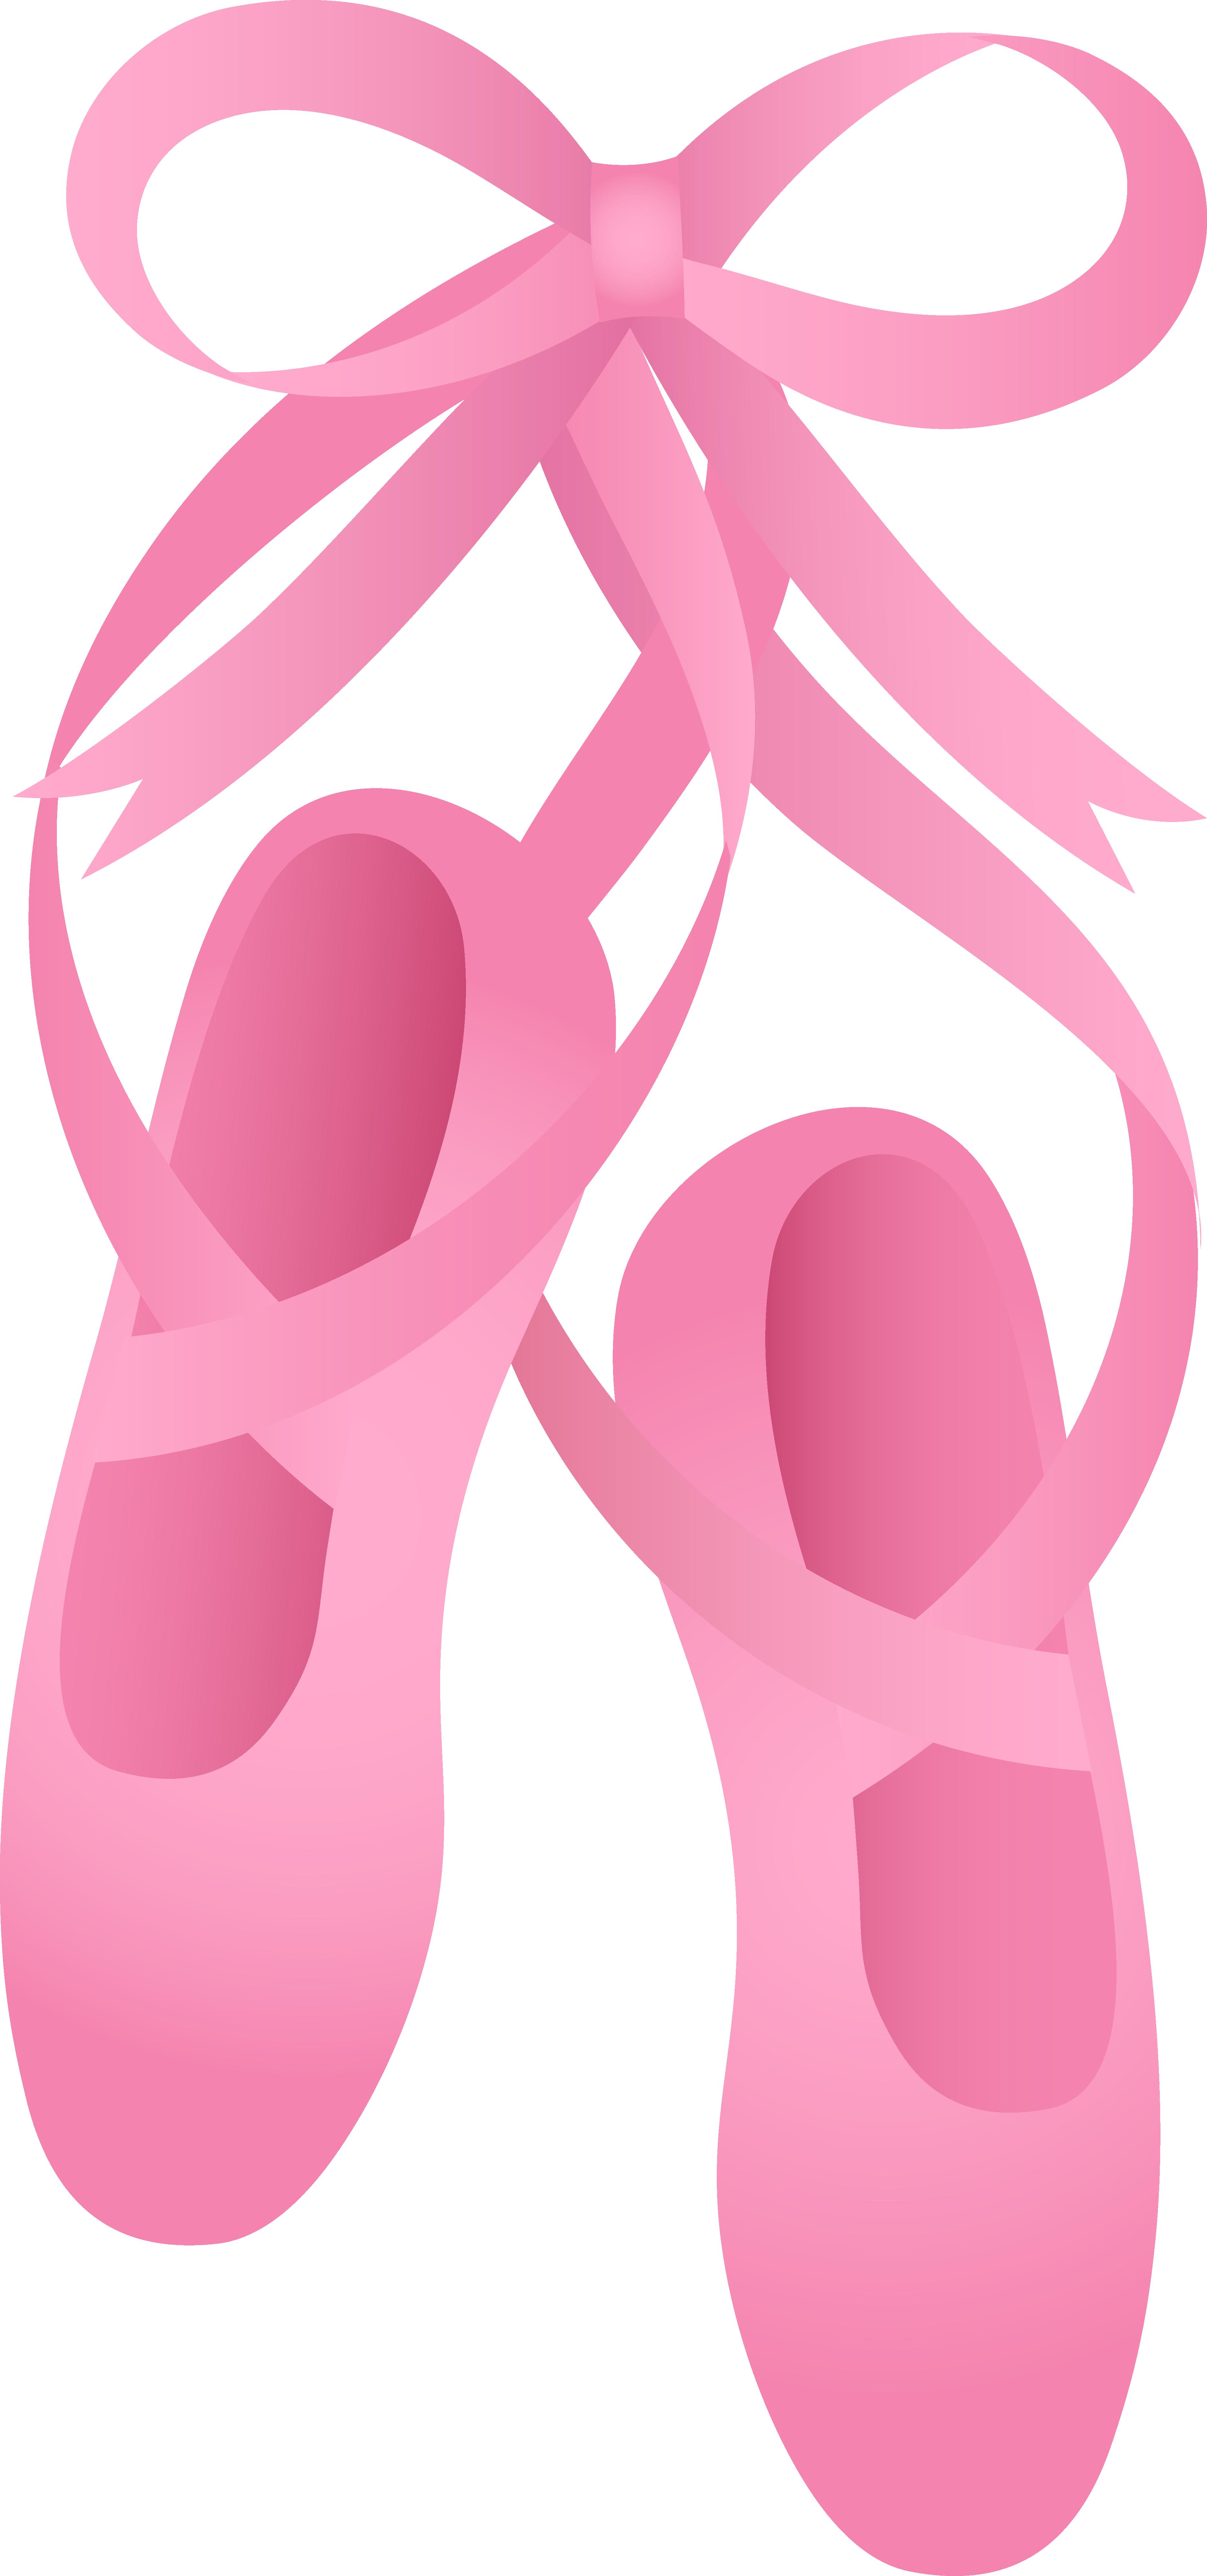 Free Cartoon Ballet Shoes, Download Free Clip Art, Free Clip.